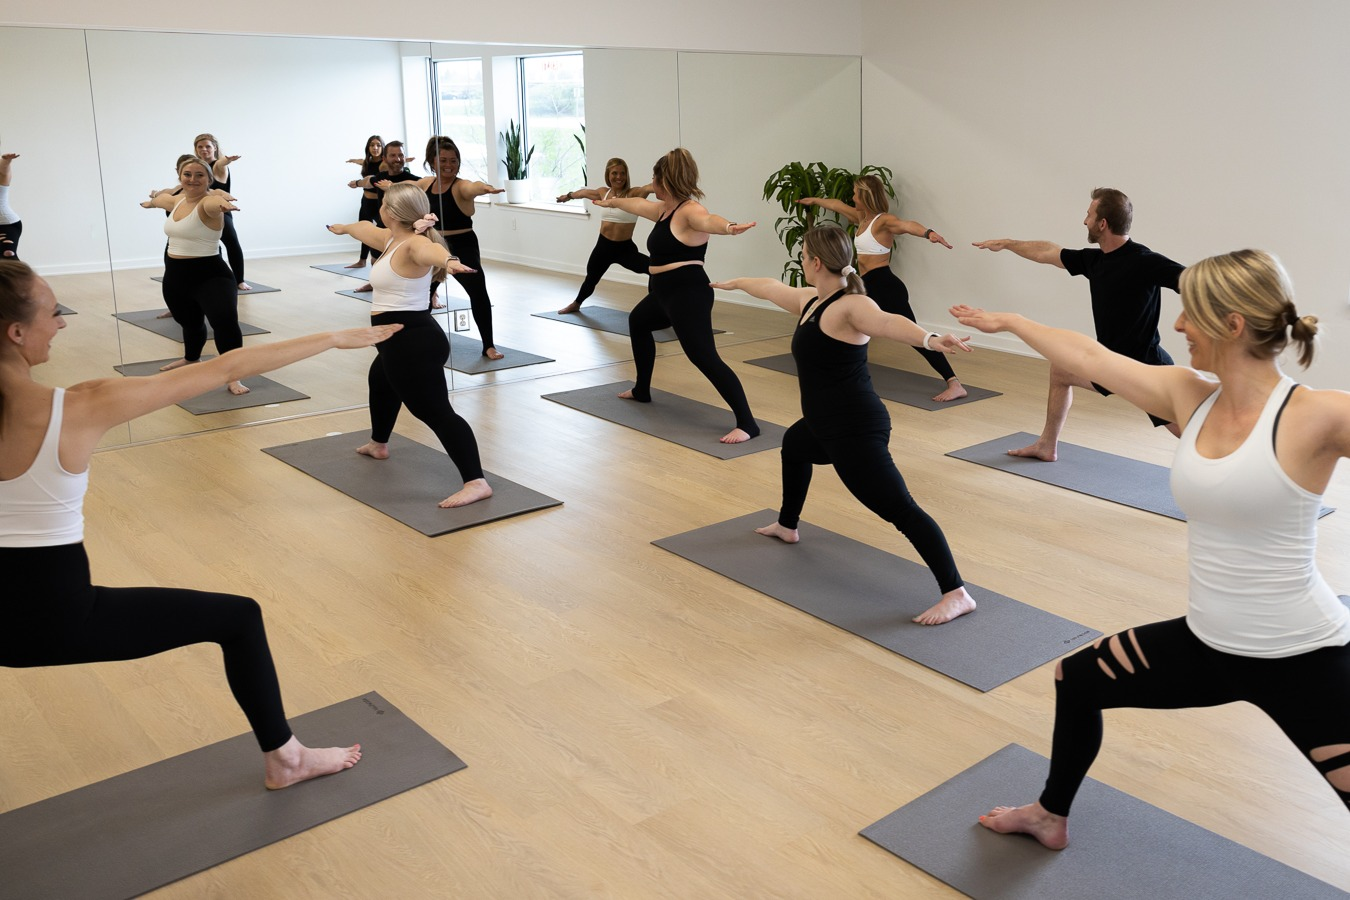 Sweat Shop Hot Yoga Oconomowoc Yoga Group Class 6 Resize